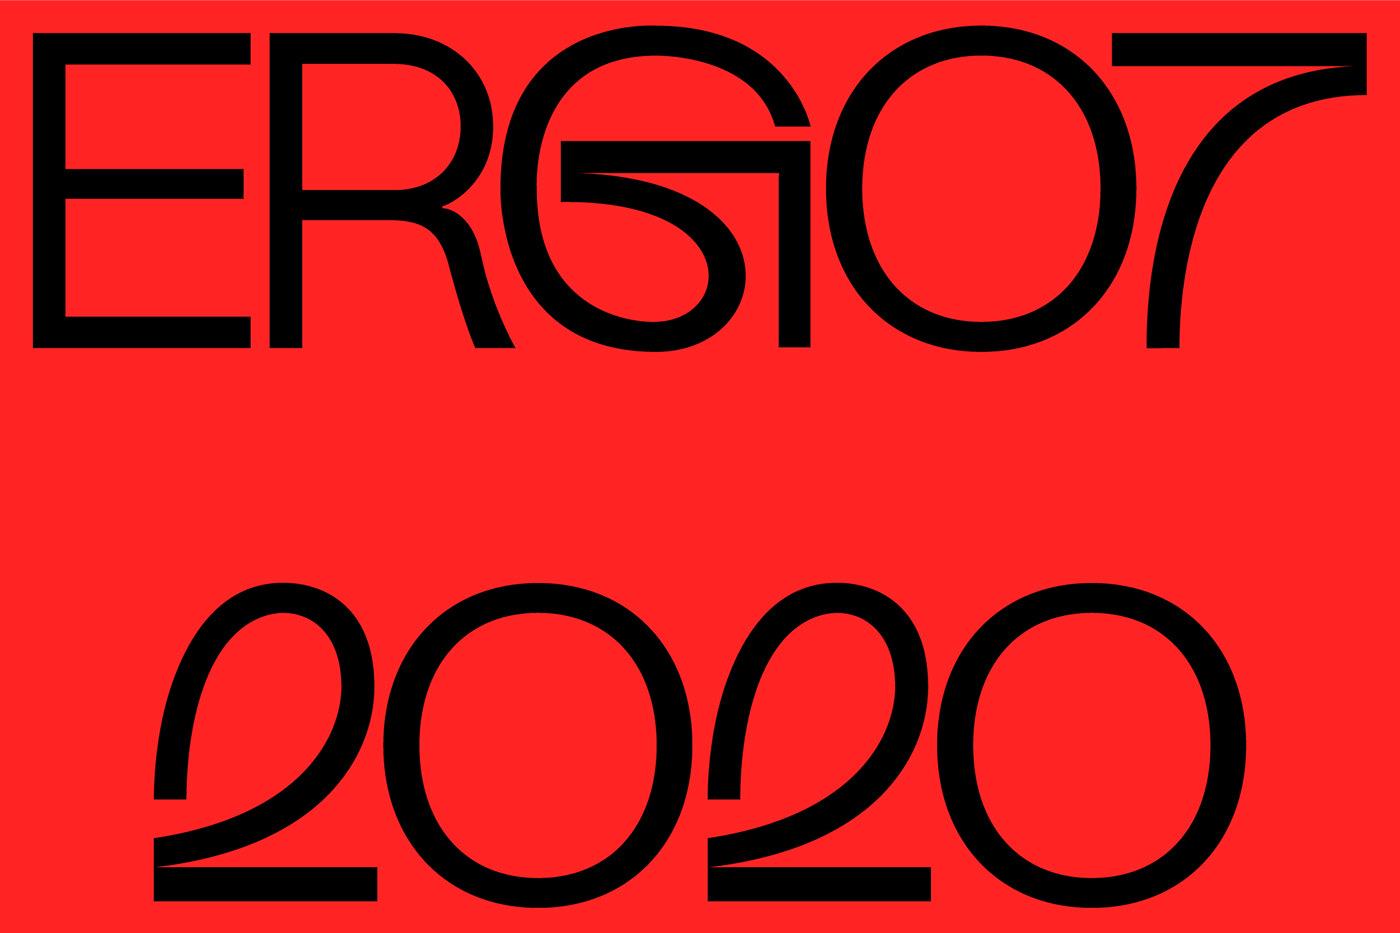 art book design editorial graphic design  Layout magazine print type typography